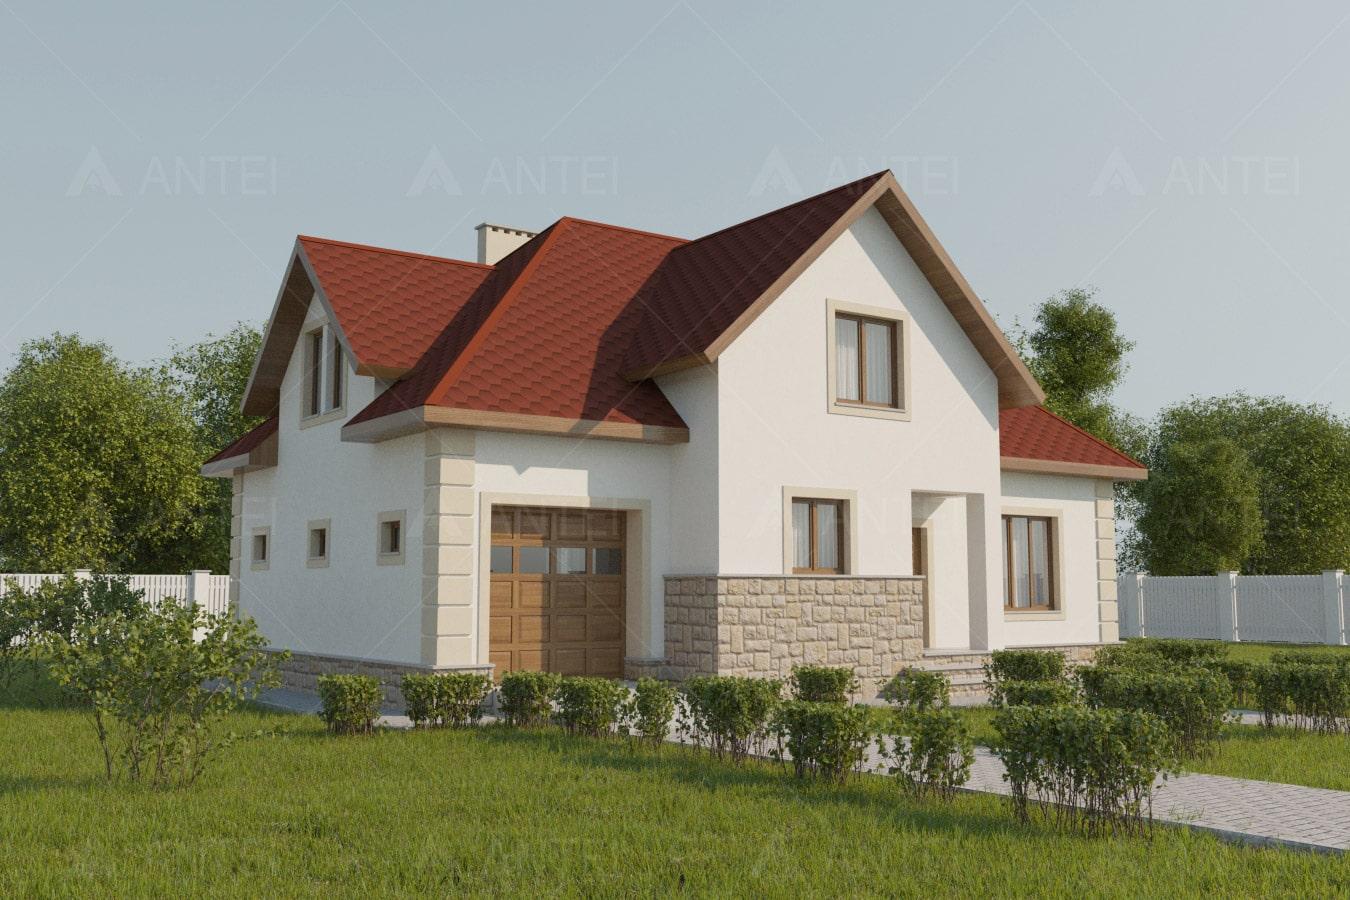 Проект мансардного дома с гаражом «КМ-52» - фото №2